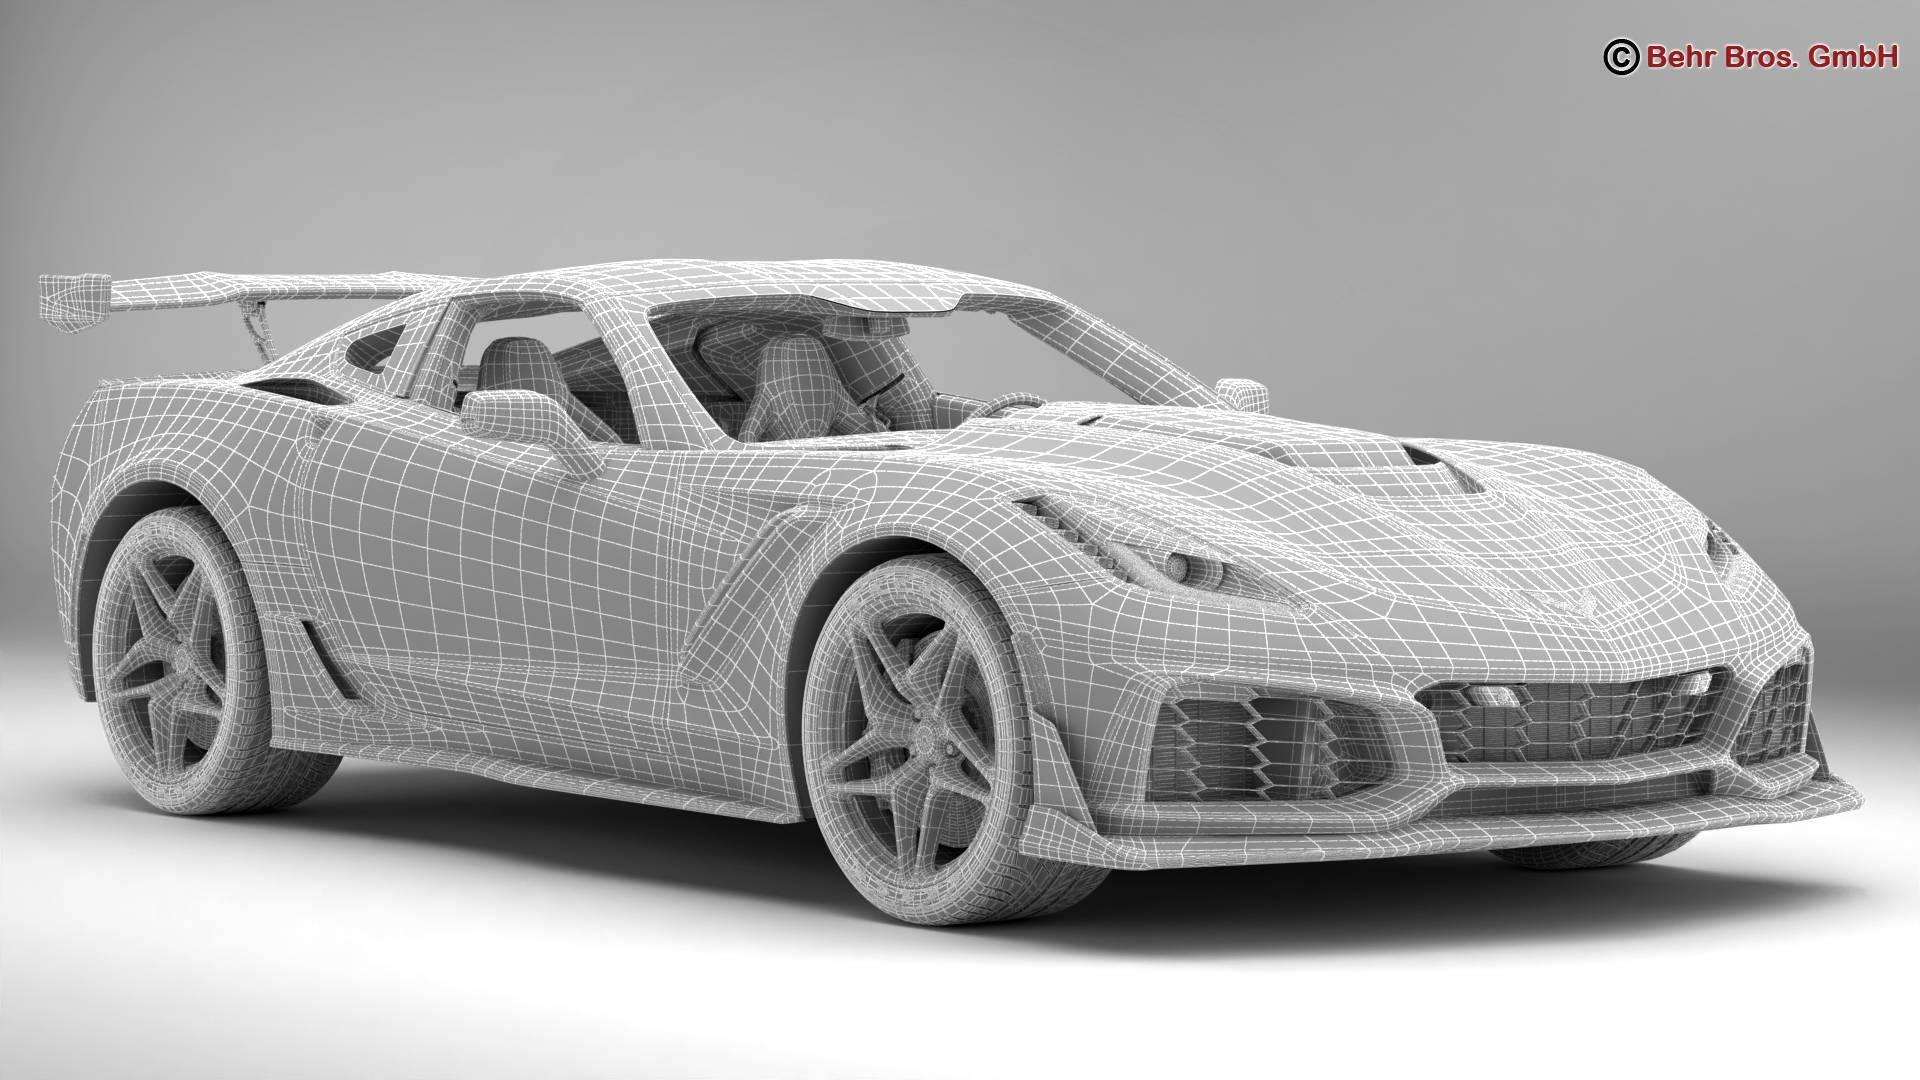 chevrolet corvette zr1 2019 3d model 3ds max fbx c4d lwo ma mb obj 275982